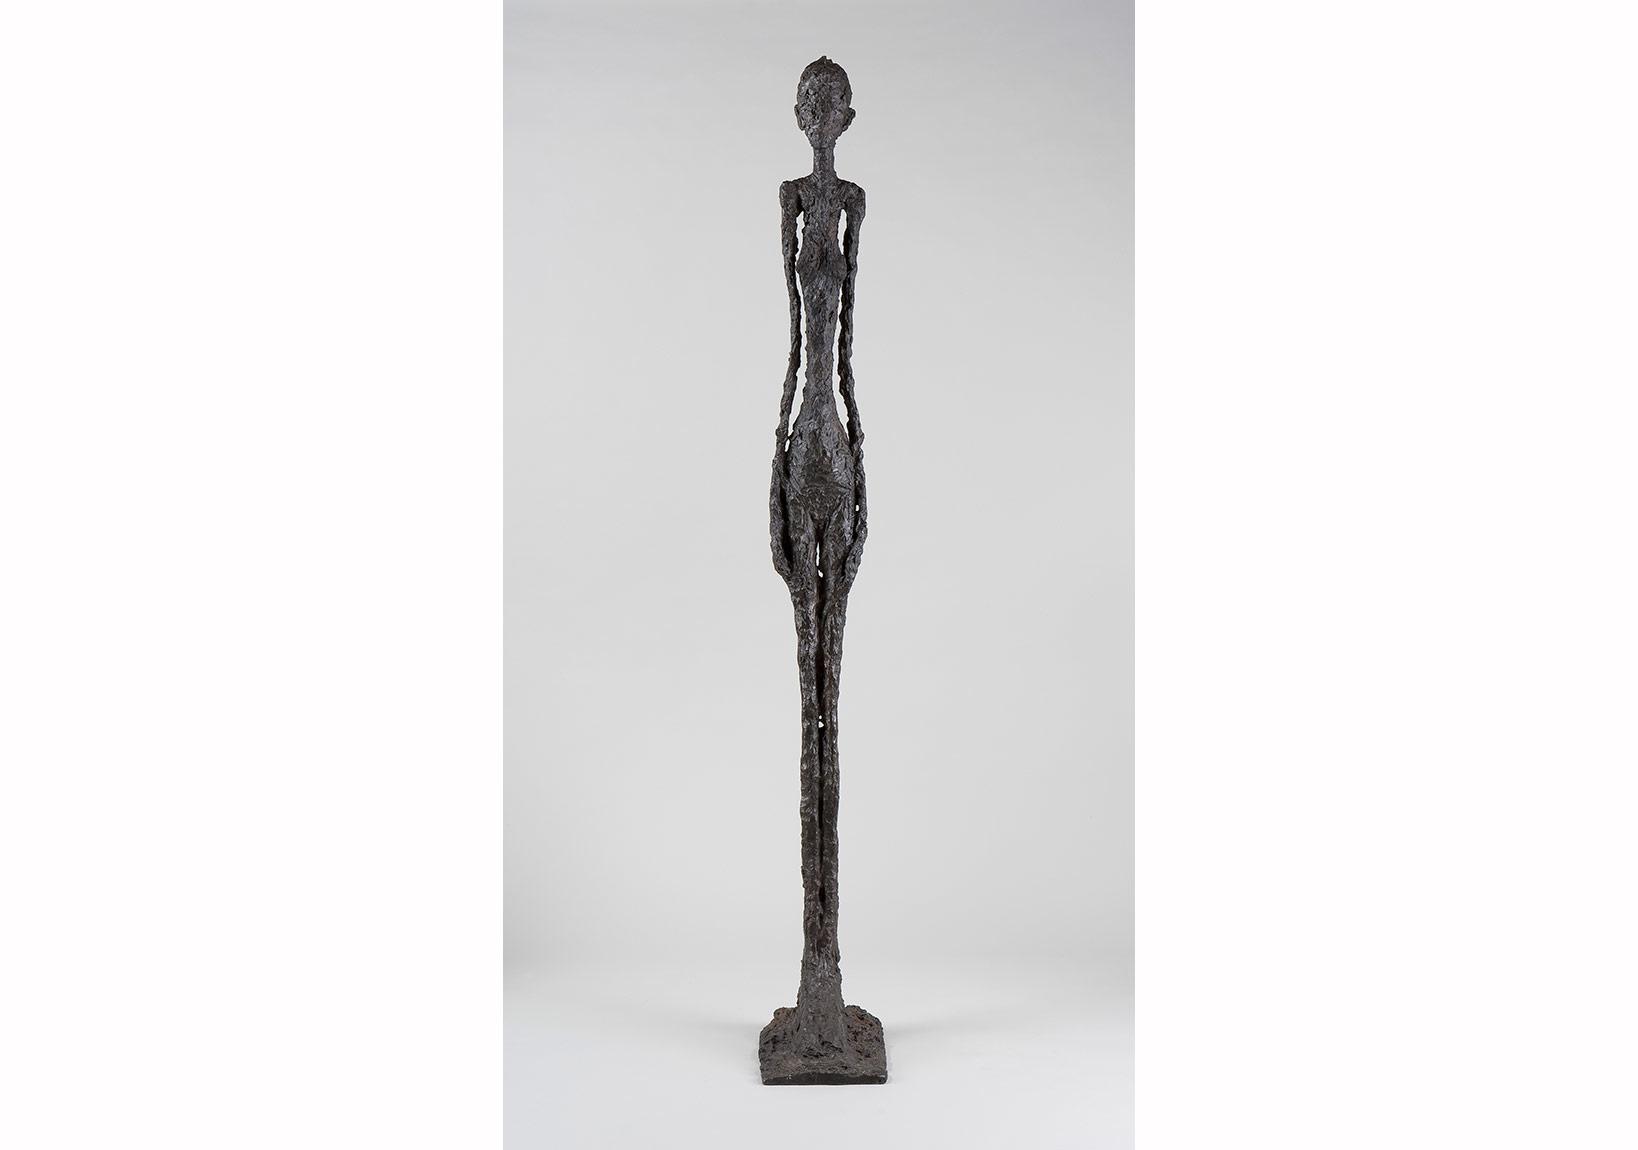 Alberto Giacometti,Büyük Kadın I, 1960-Tall Woman I, 1960Bronz / Bronze, 272 x 34,9 x 54 cm Giacometti Vakfı Koleksiyonu, Paris, env. 1994-0173 / Giacometti Foundation Collection, Paris, inv. 1994-0173 © Estate Giacometti (Fondation Giacometti + ADAGP) Paris, 2015